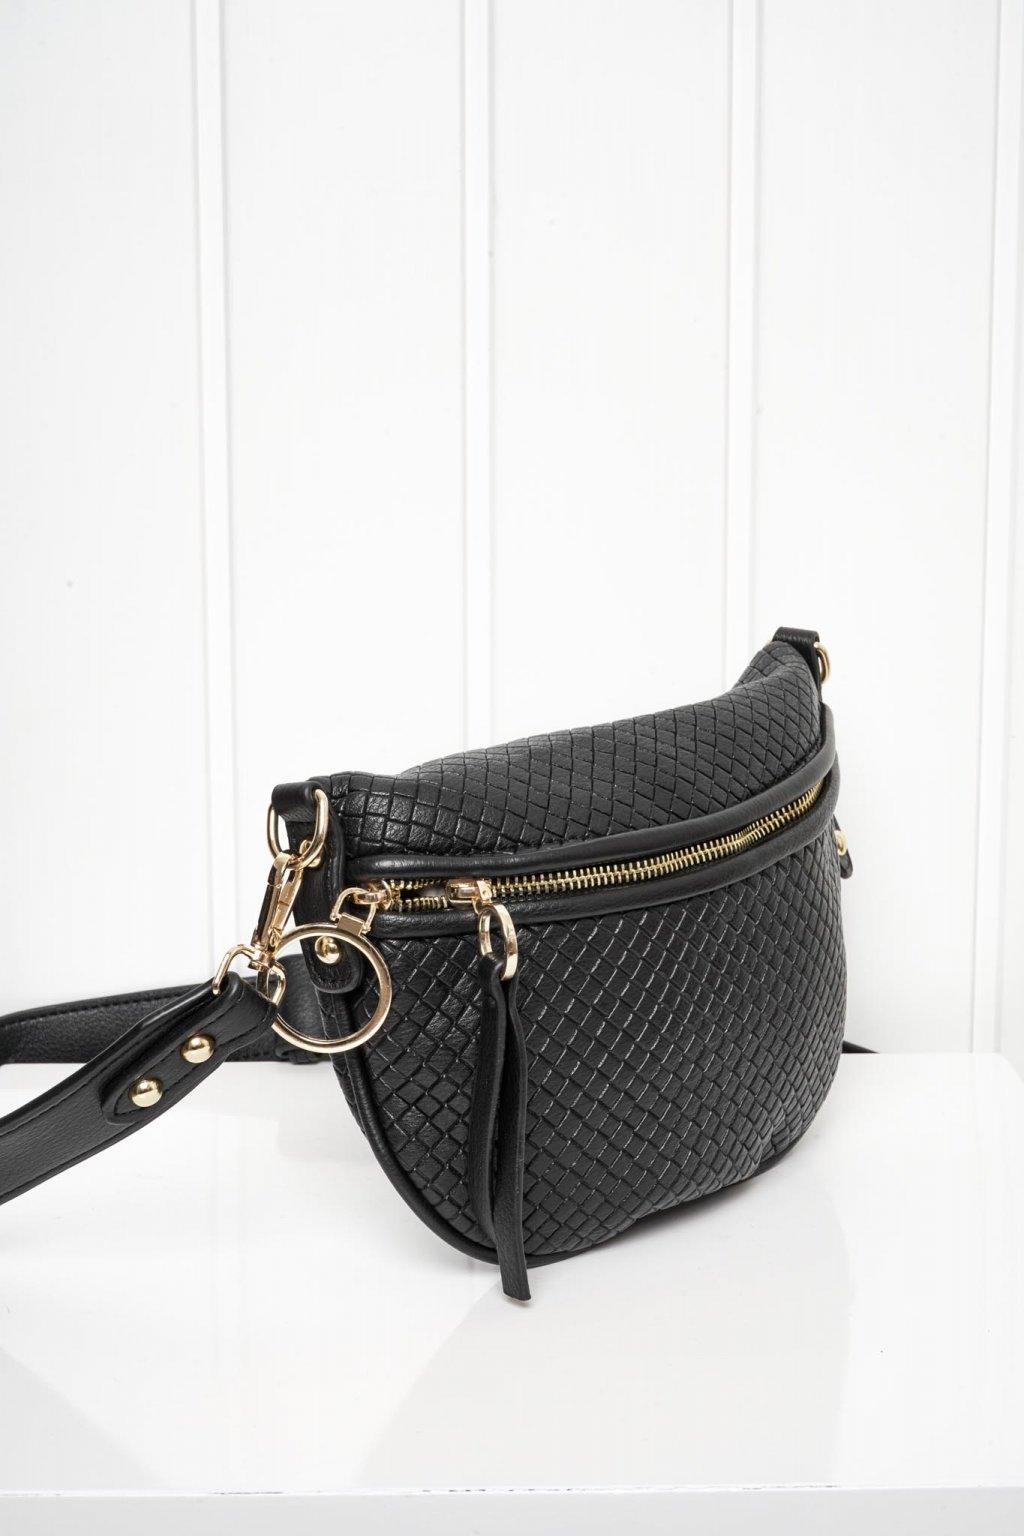 Kabelka, crossbody, ruksak, shopping bag, shopperka, 268